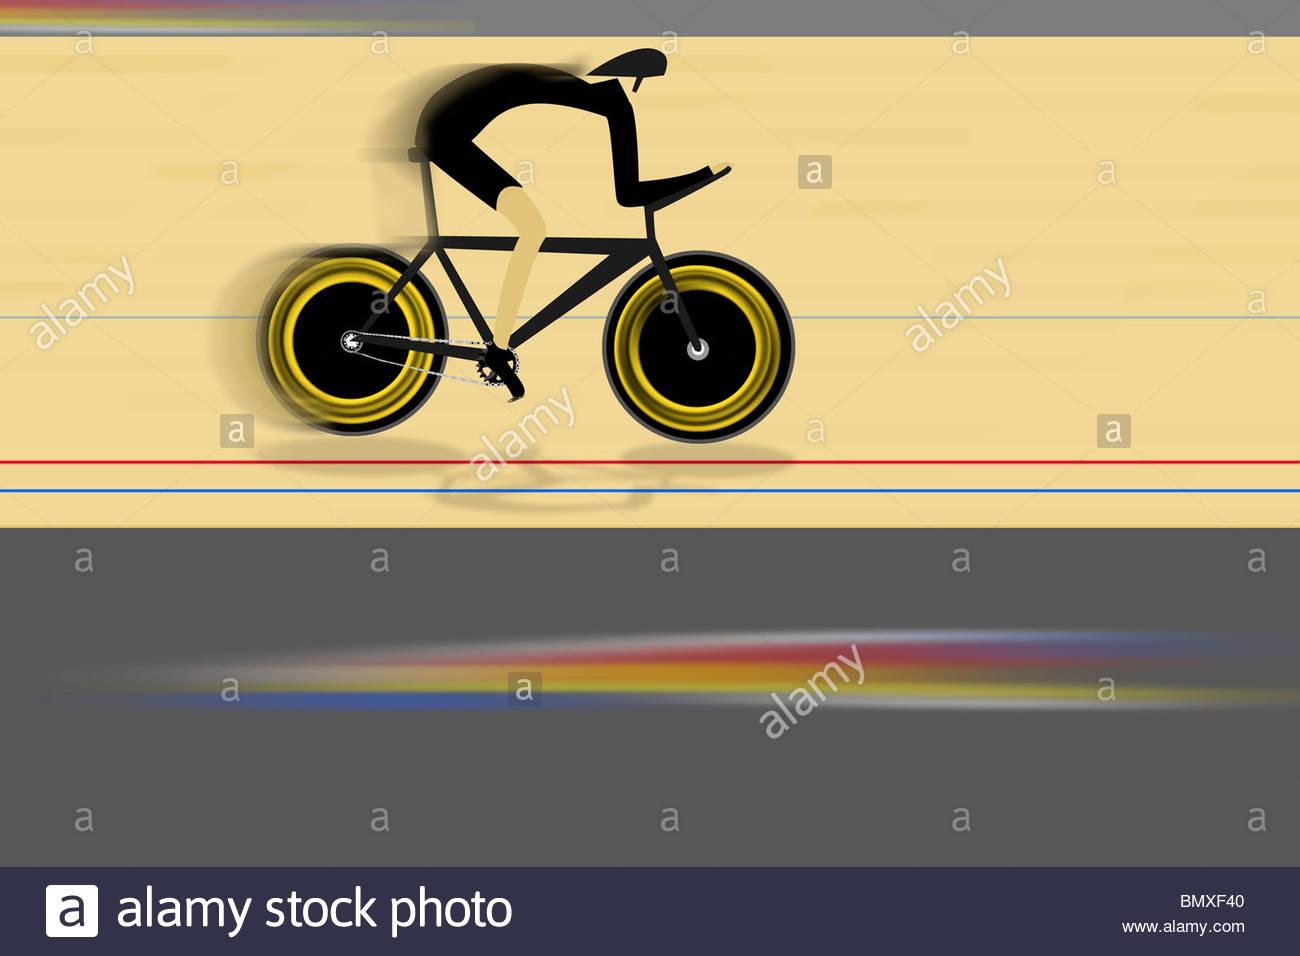 Illustration of cyclist - Stock Image